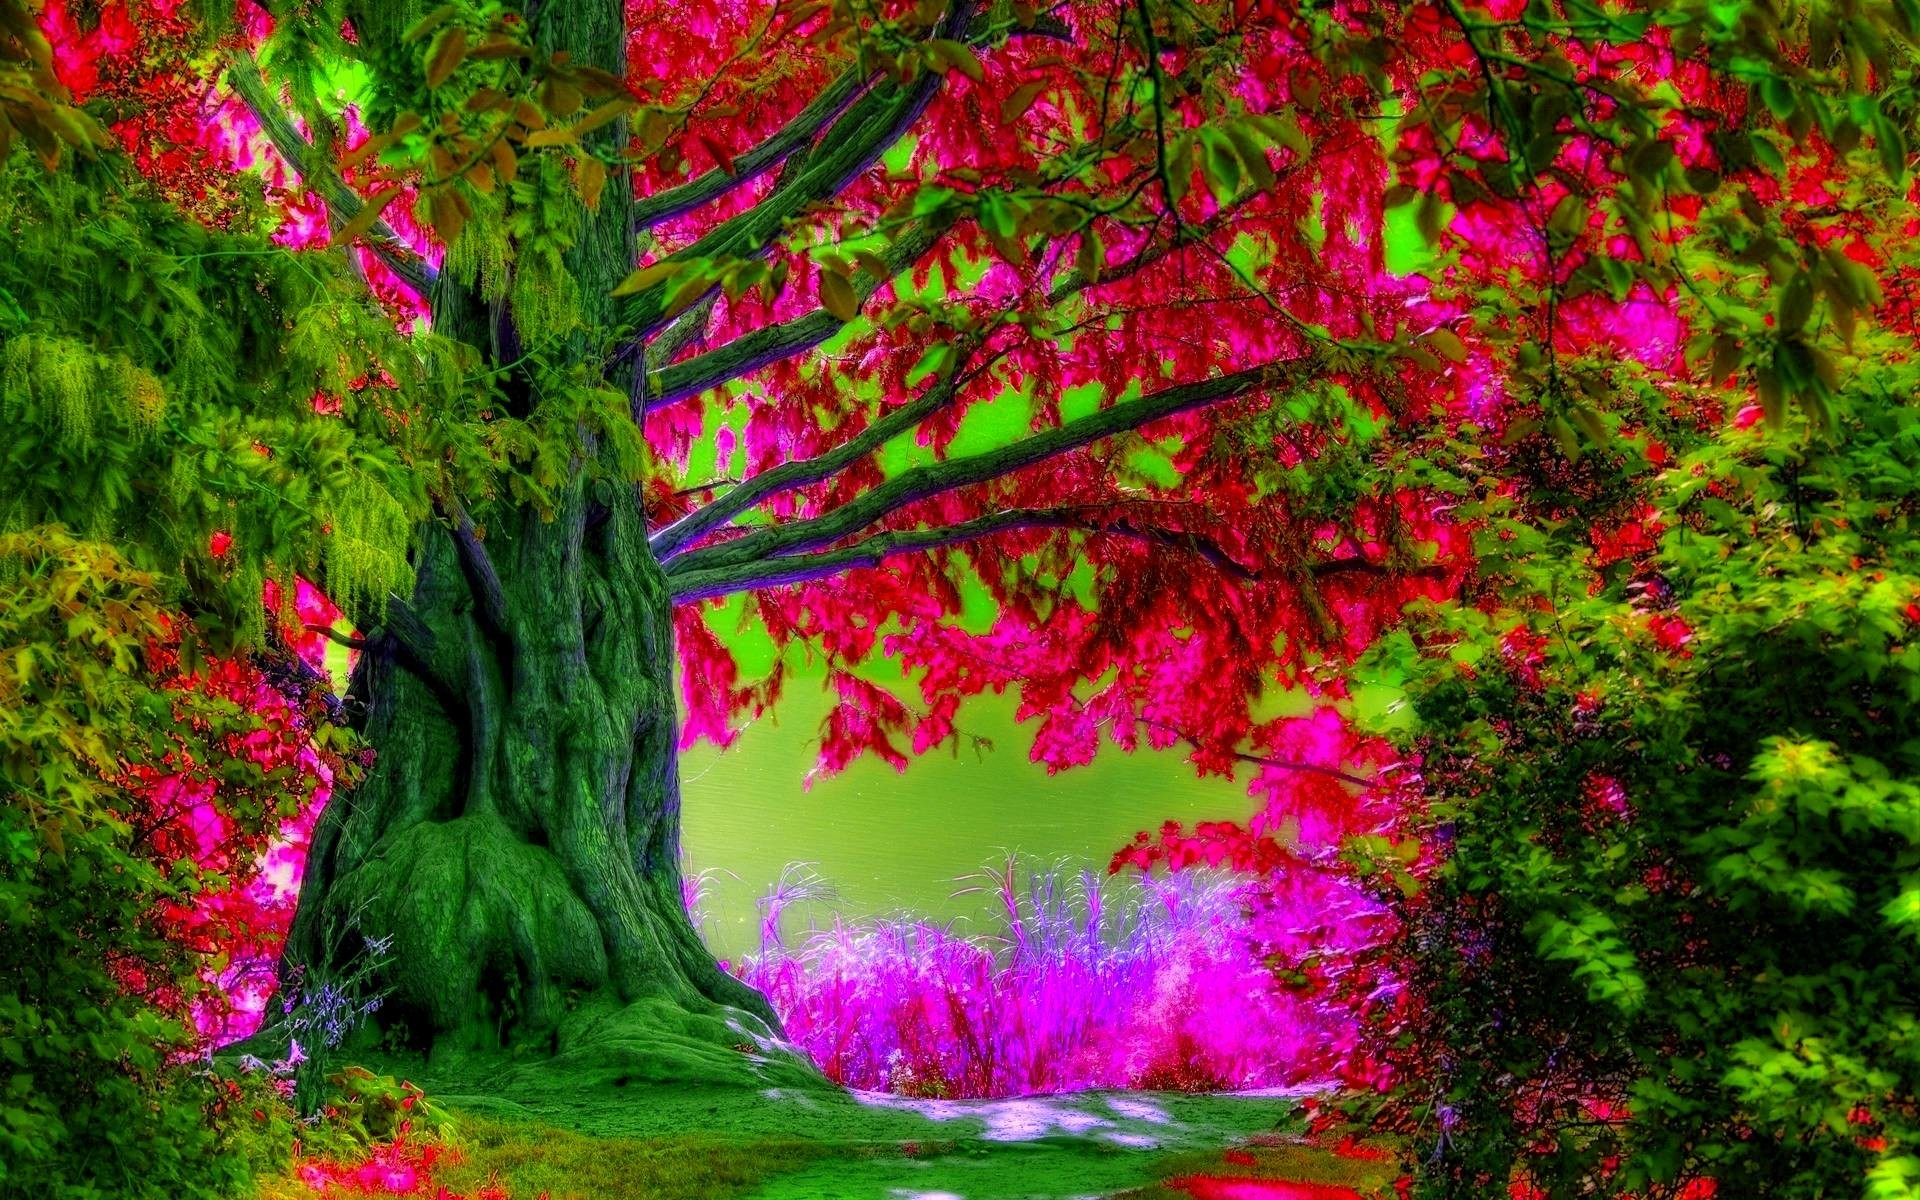 Spring Trees Wallpaper Desktop Widescreen 2 HD Wallpapers   Hdimges.